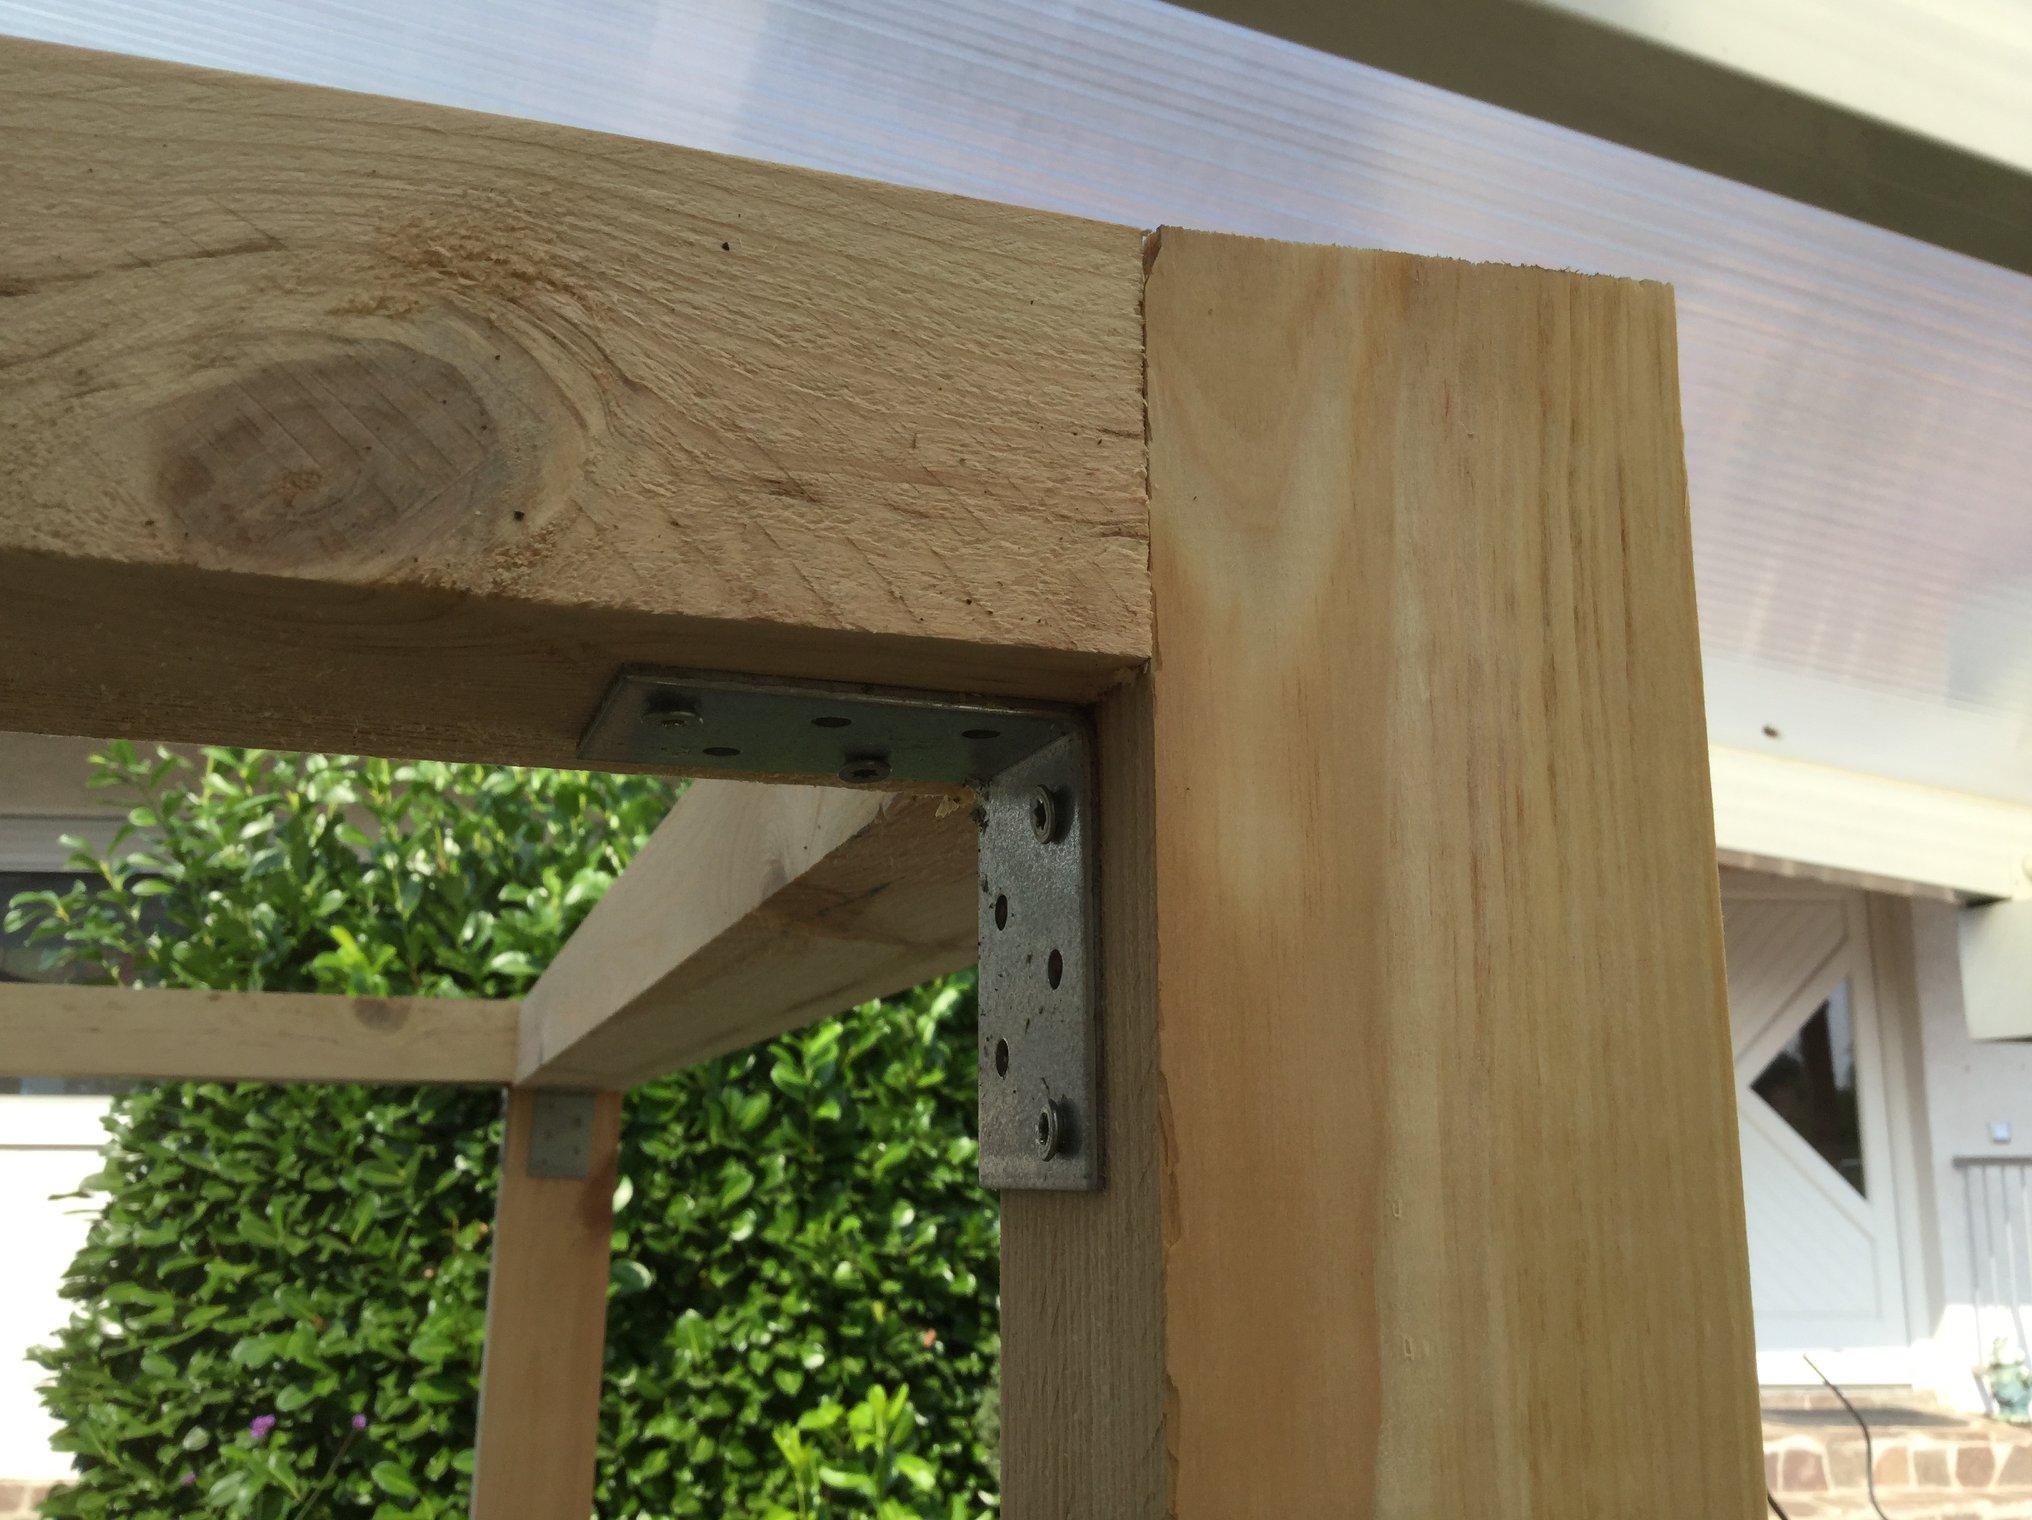 Relativ Paletten Upcycling: Massiven Holzunterstand selbst bauen RV07